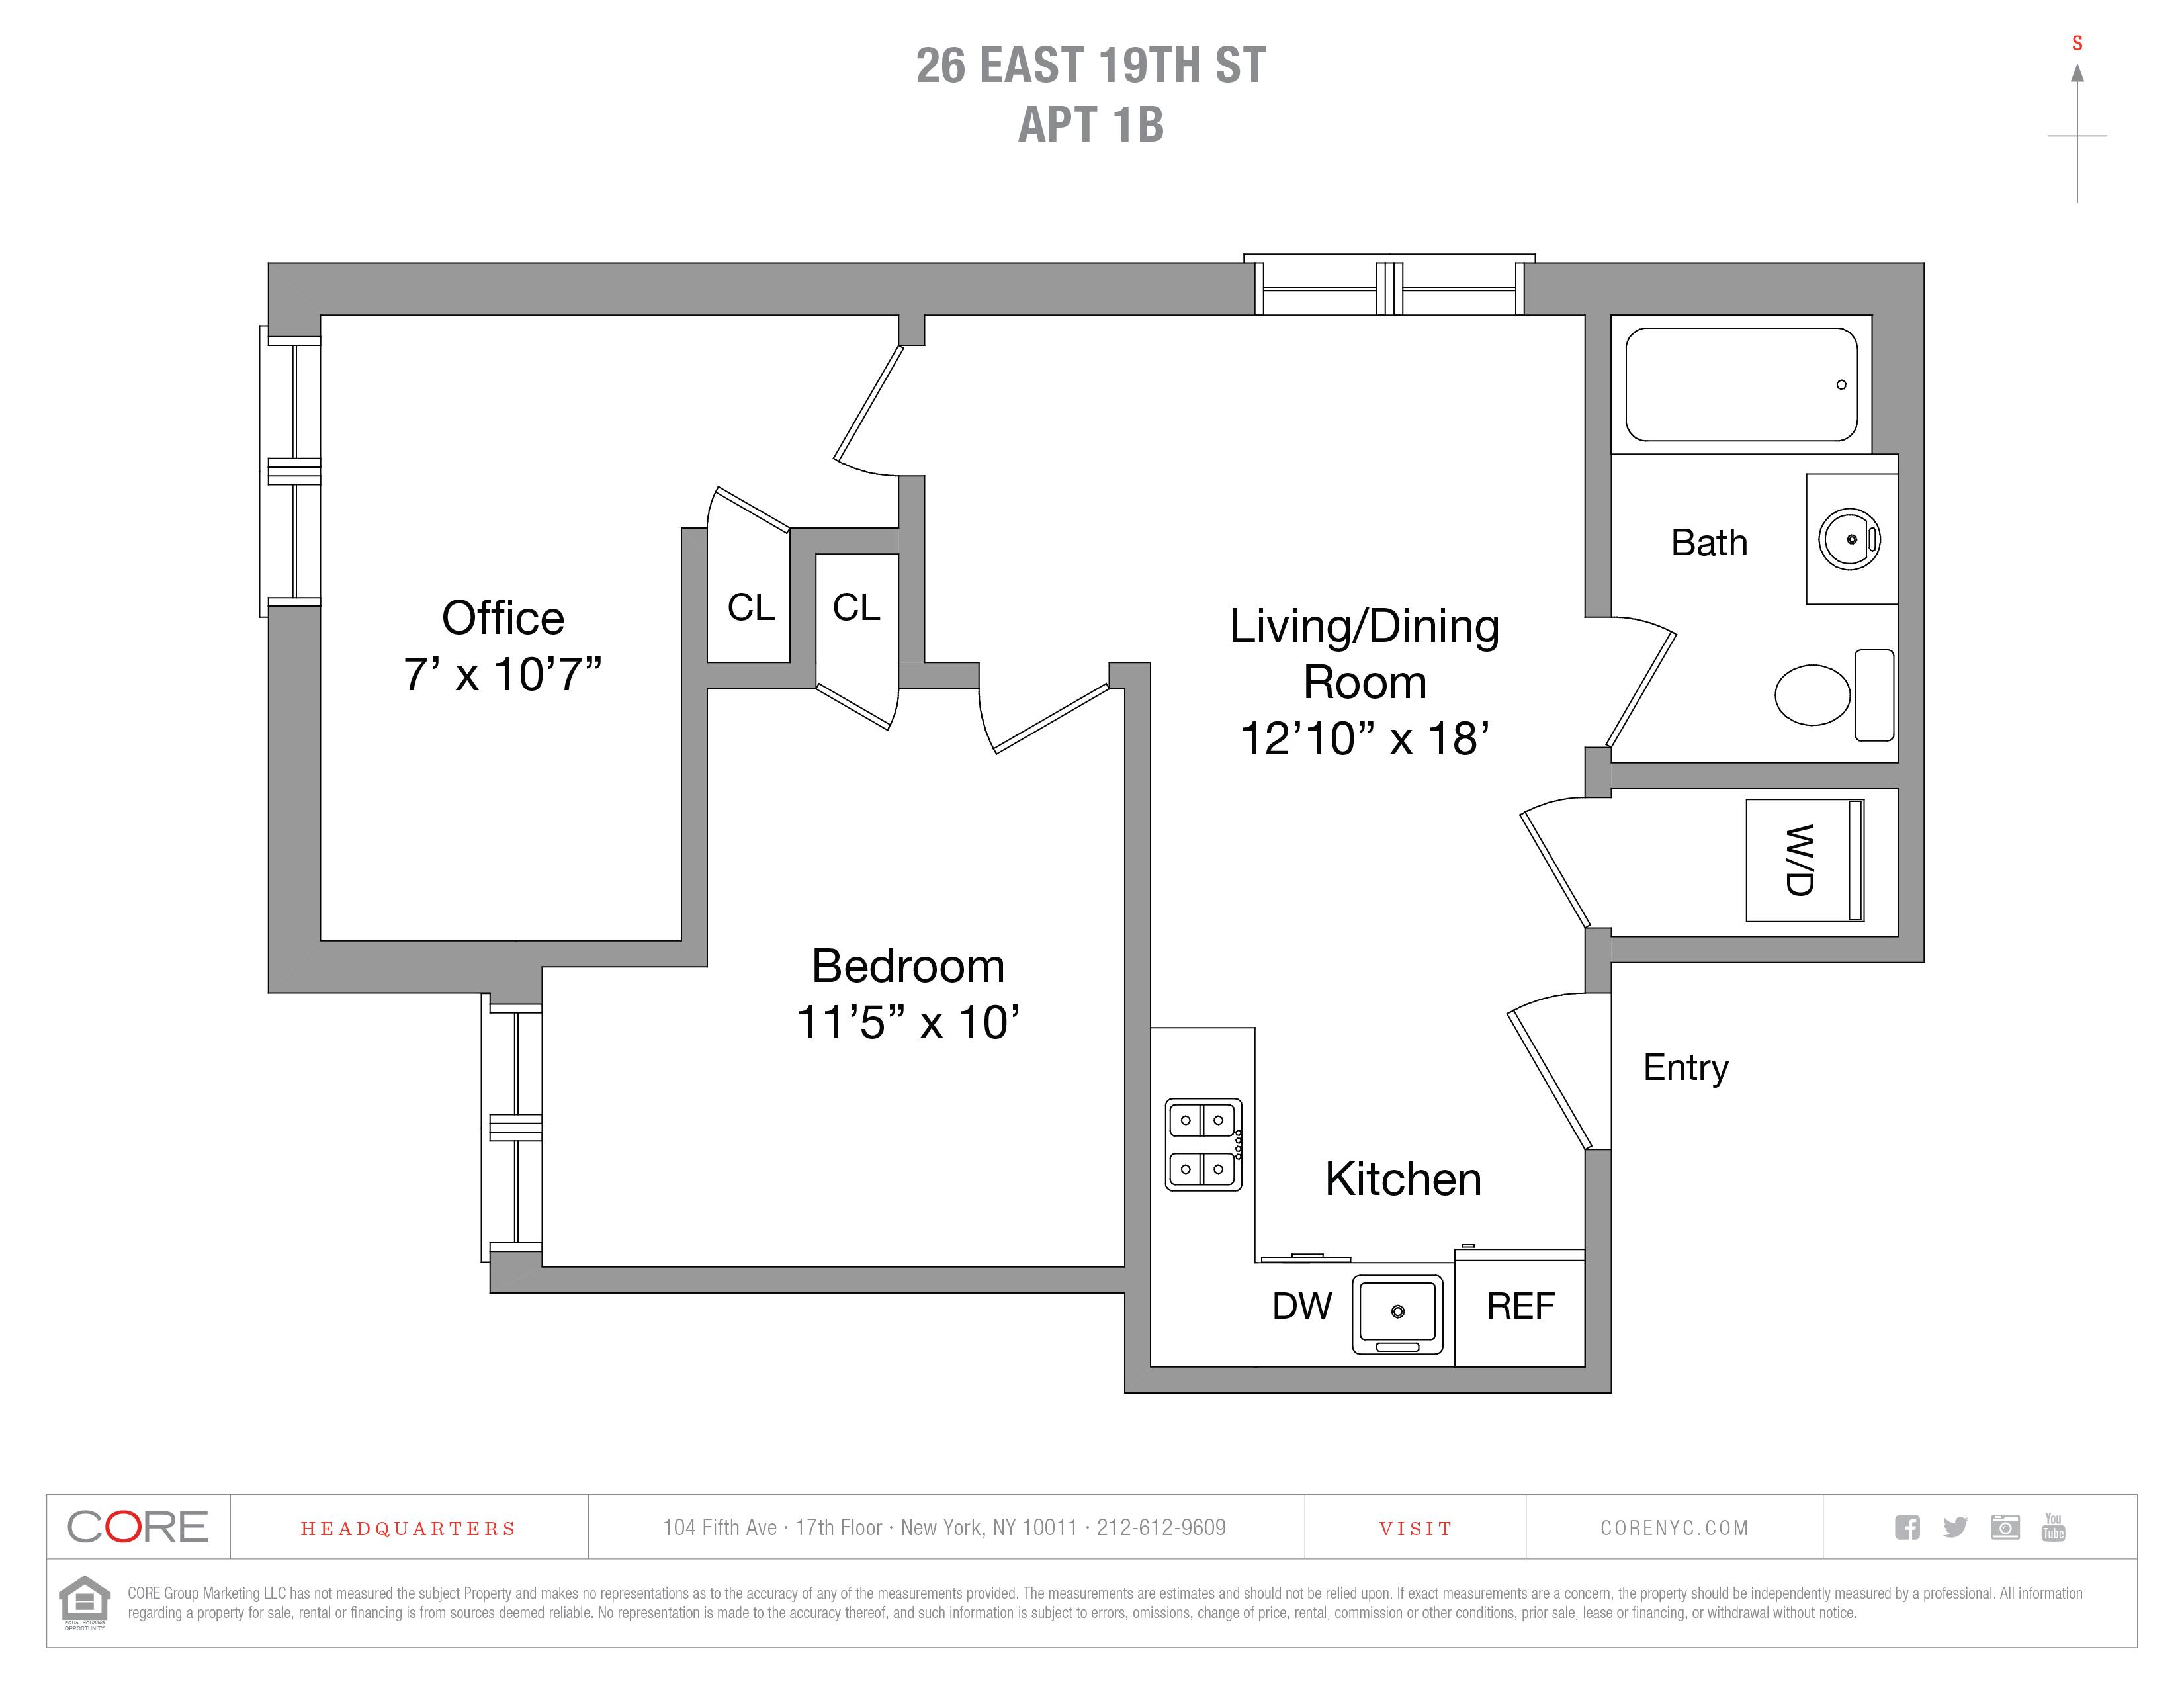 26 East 19th St. 1B, Brooklyn, NY 11226